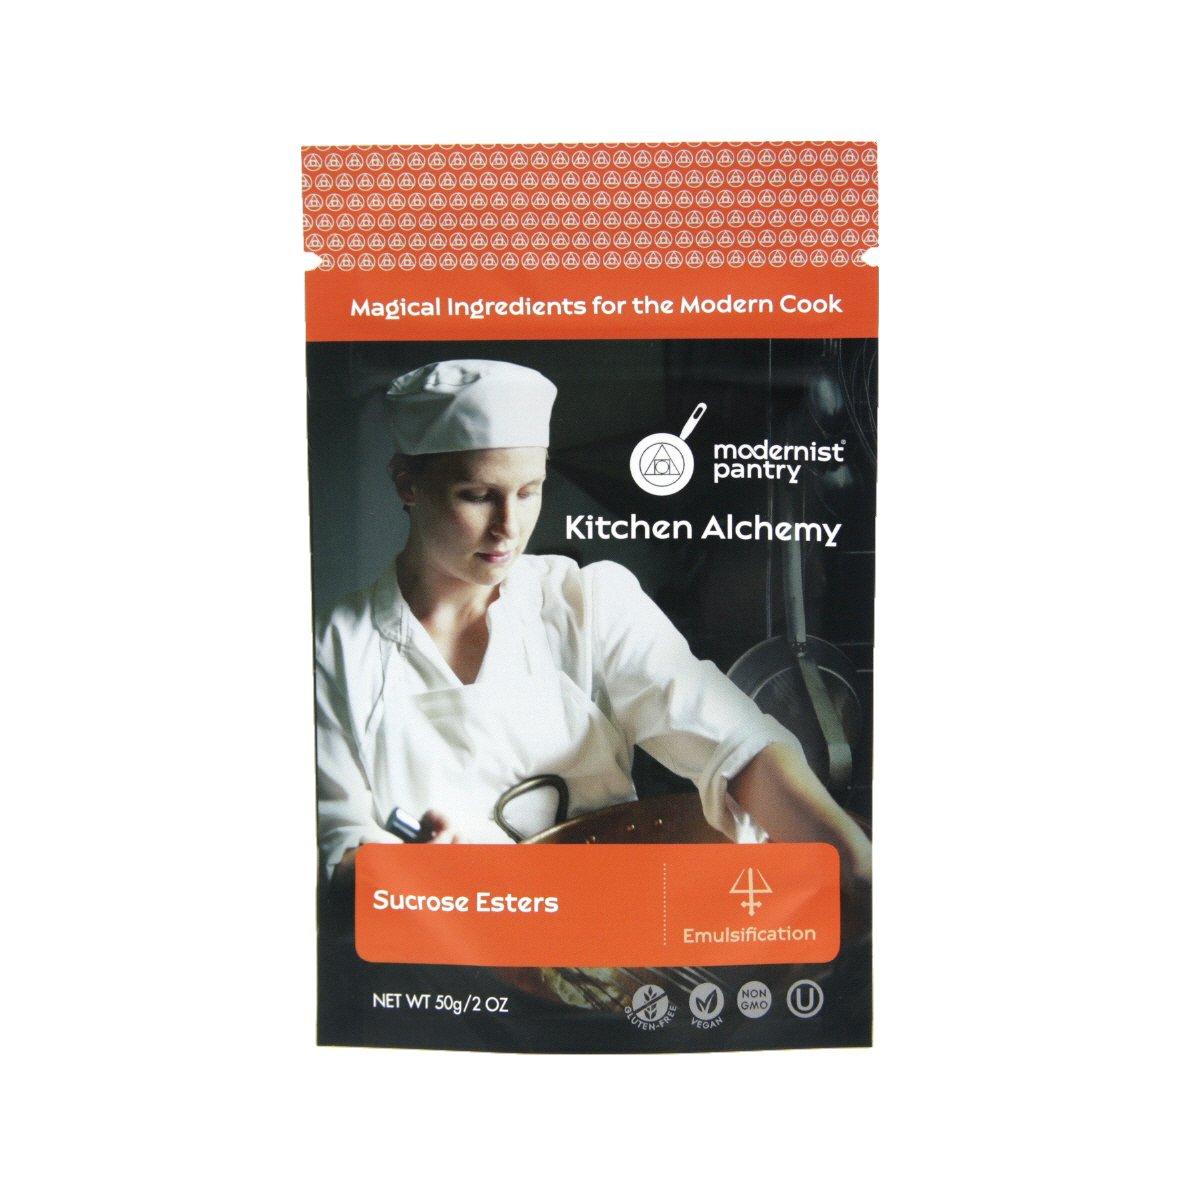 Food Grade Sucrose Esters (Molecular Gastronomy) ⊘ Non-GMO ☮ Vegan ✡ OU Kosher Certified - 50g/2oz